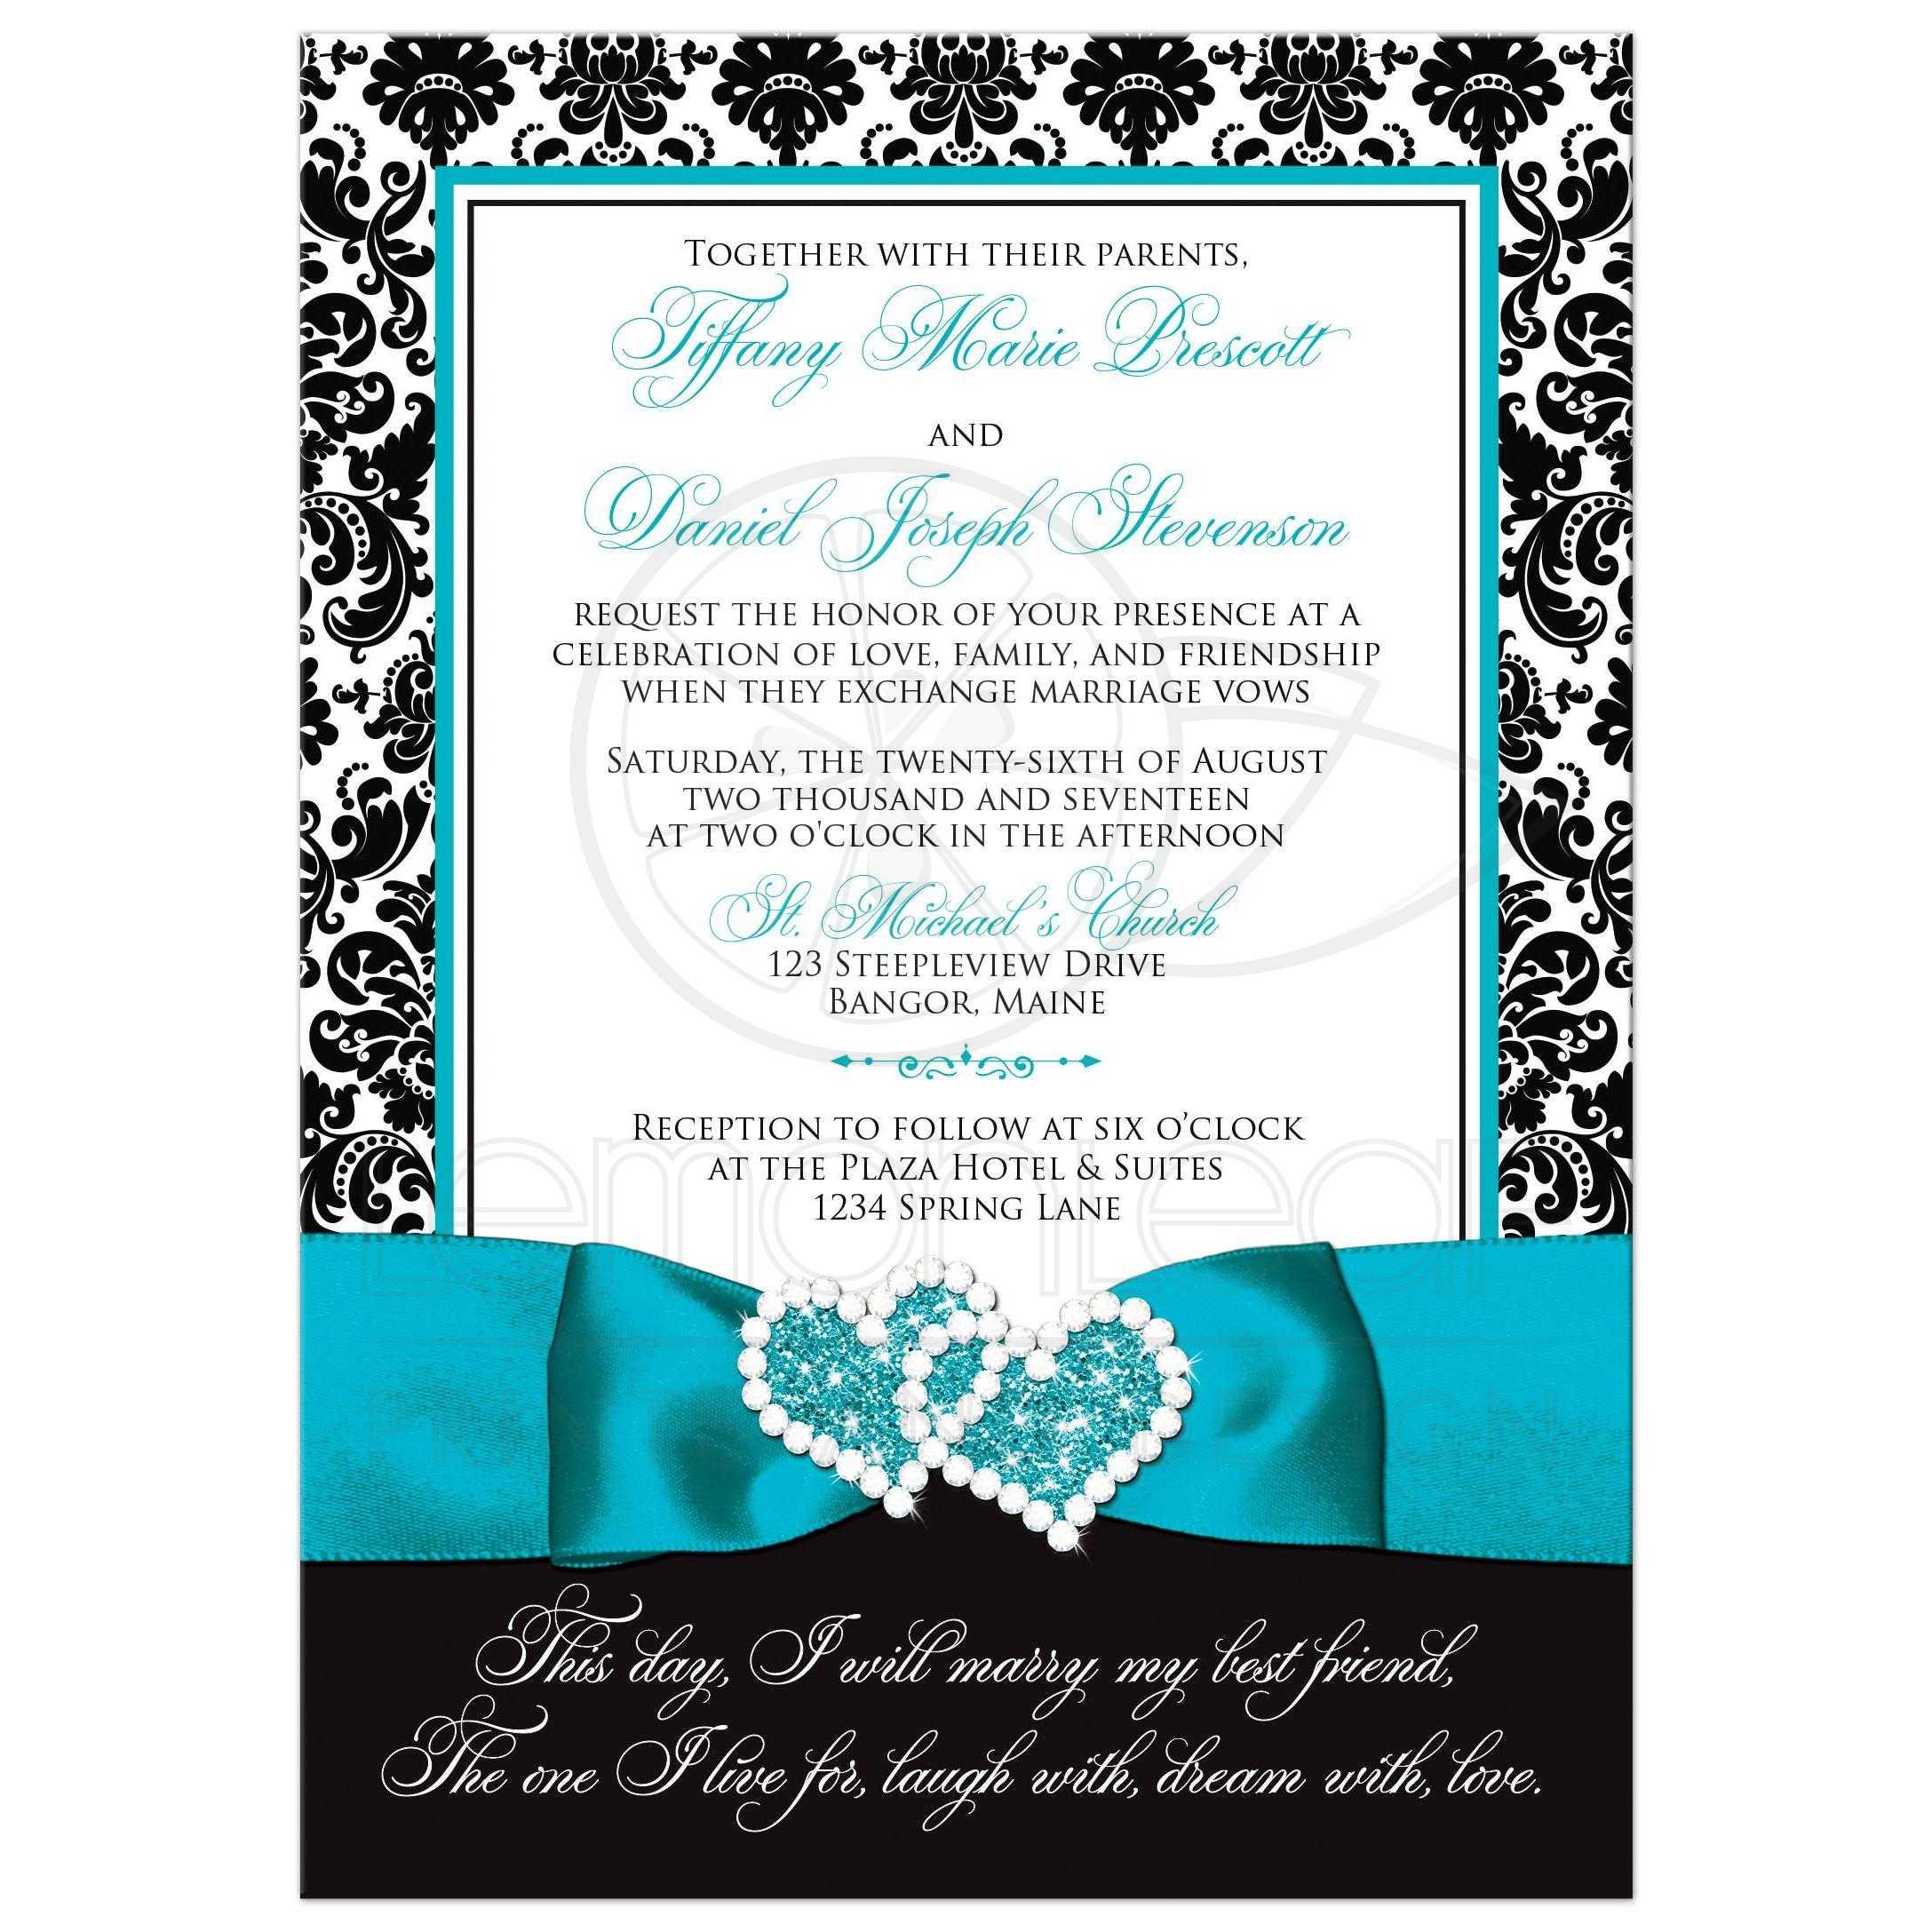 wedding invitations black - Boat.jeremyeaton.co